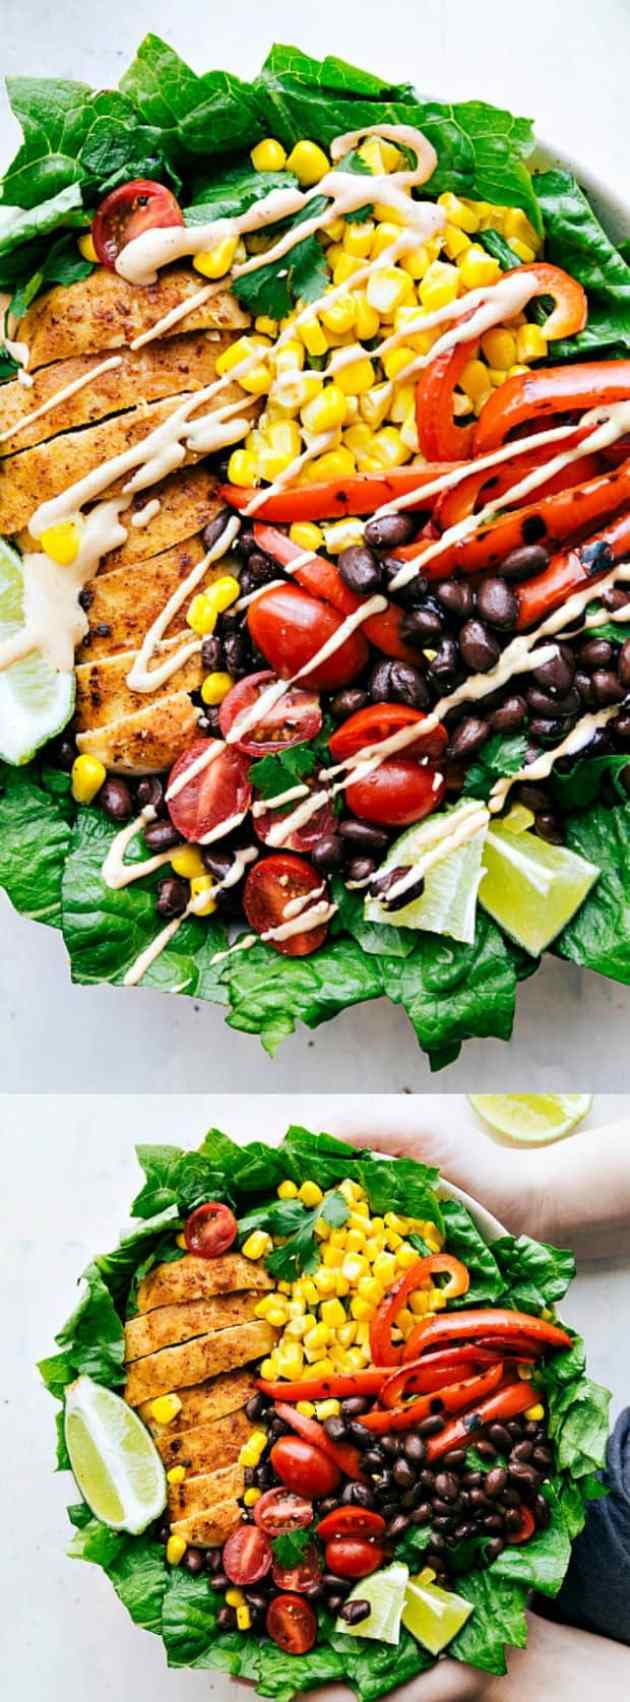 Chili Lime Chicken Salad longpin